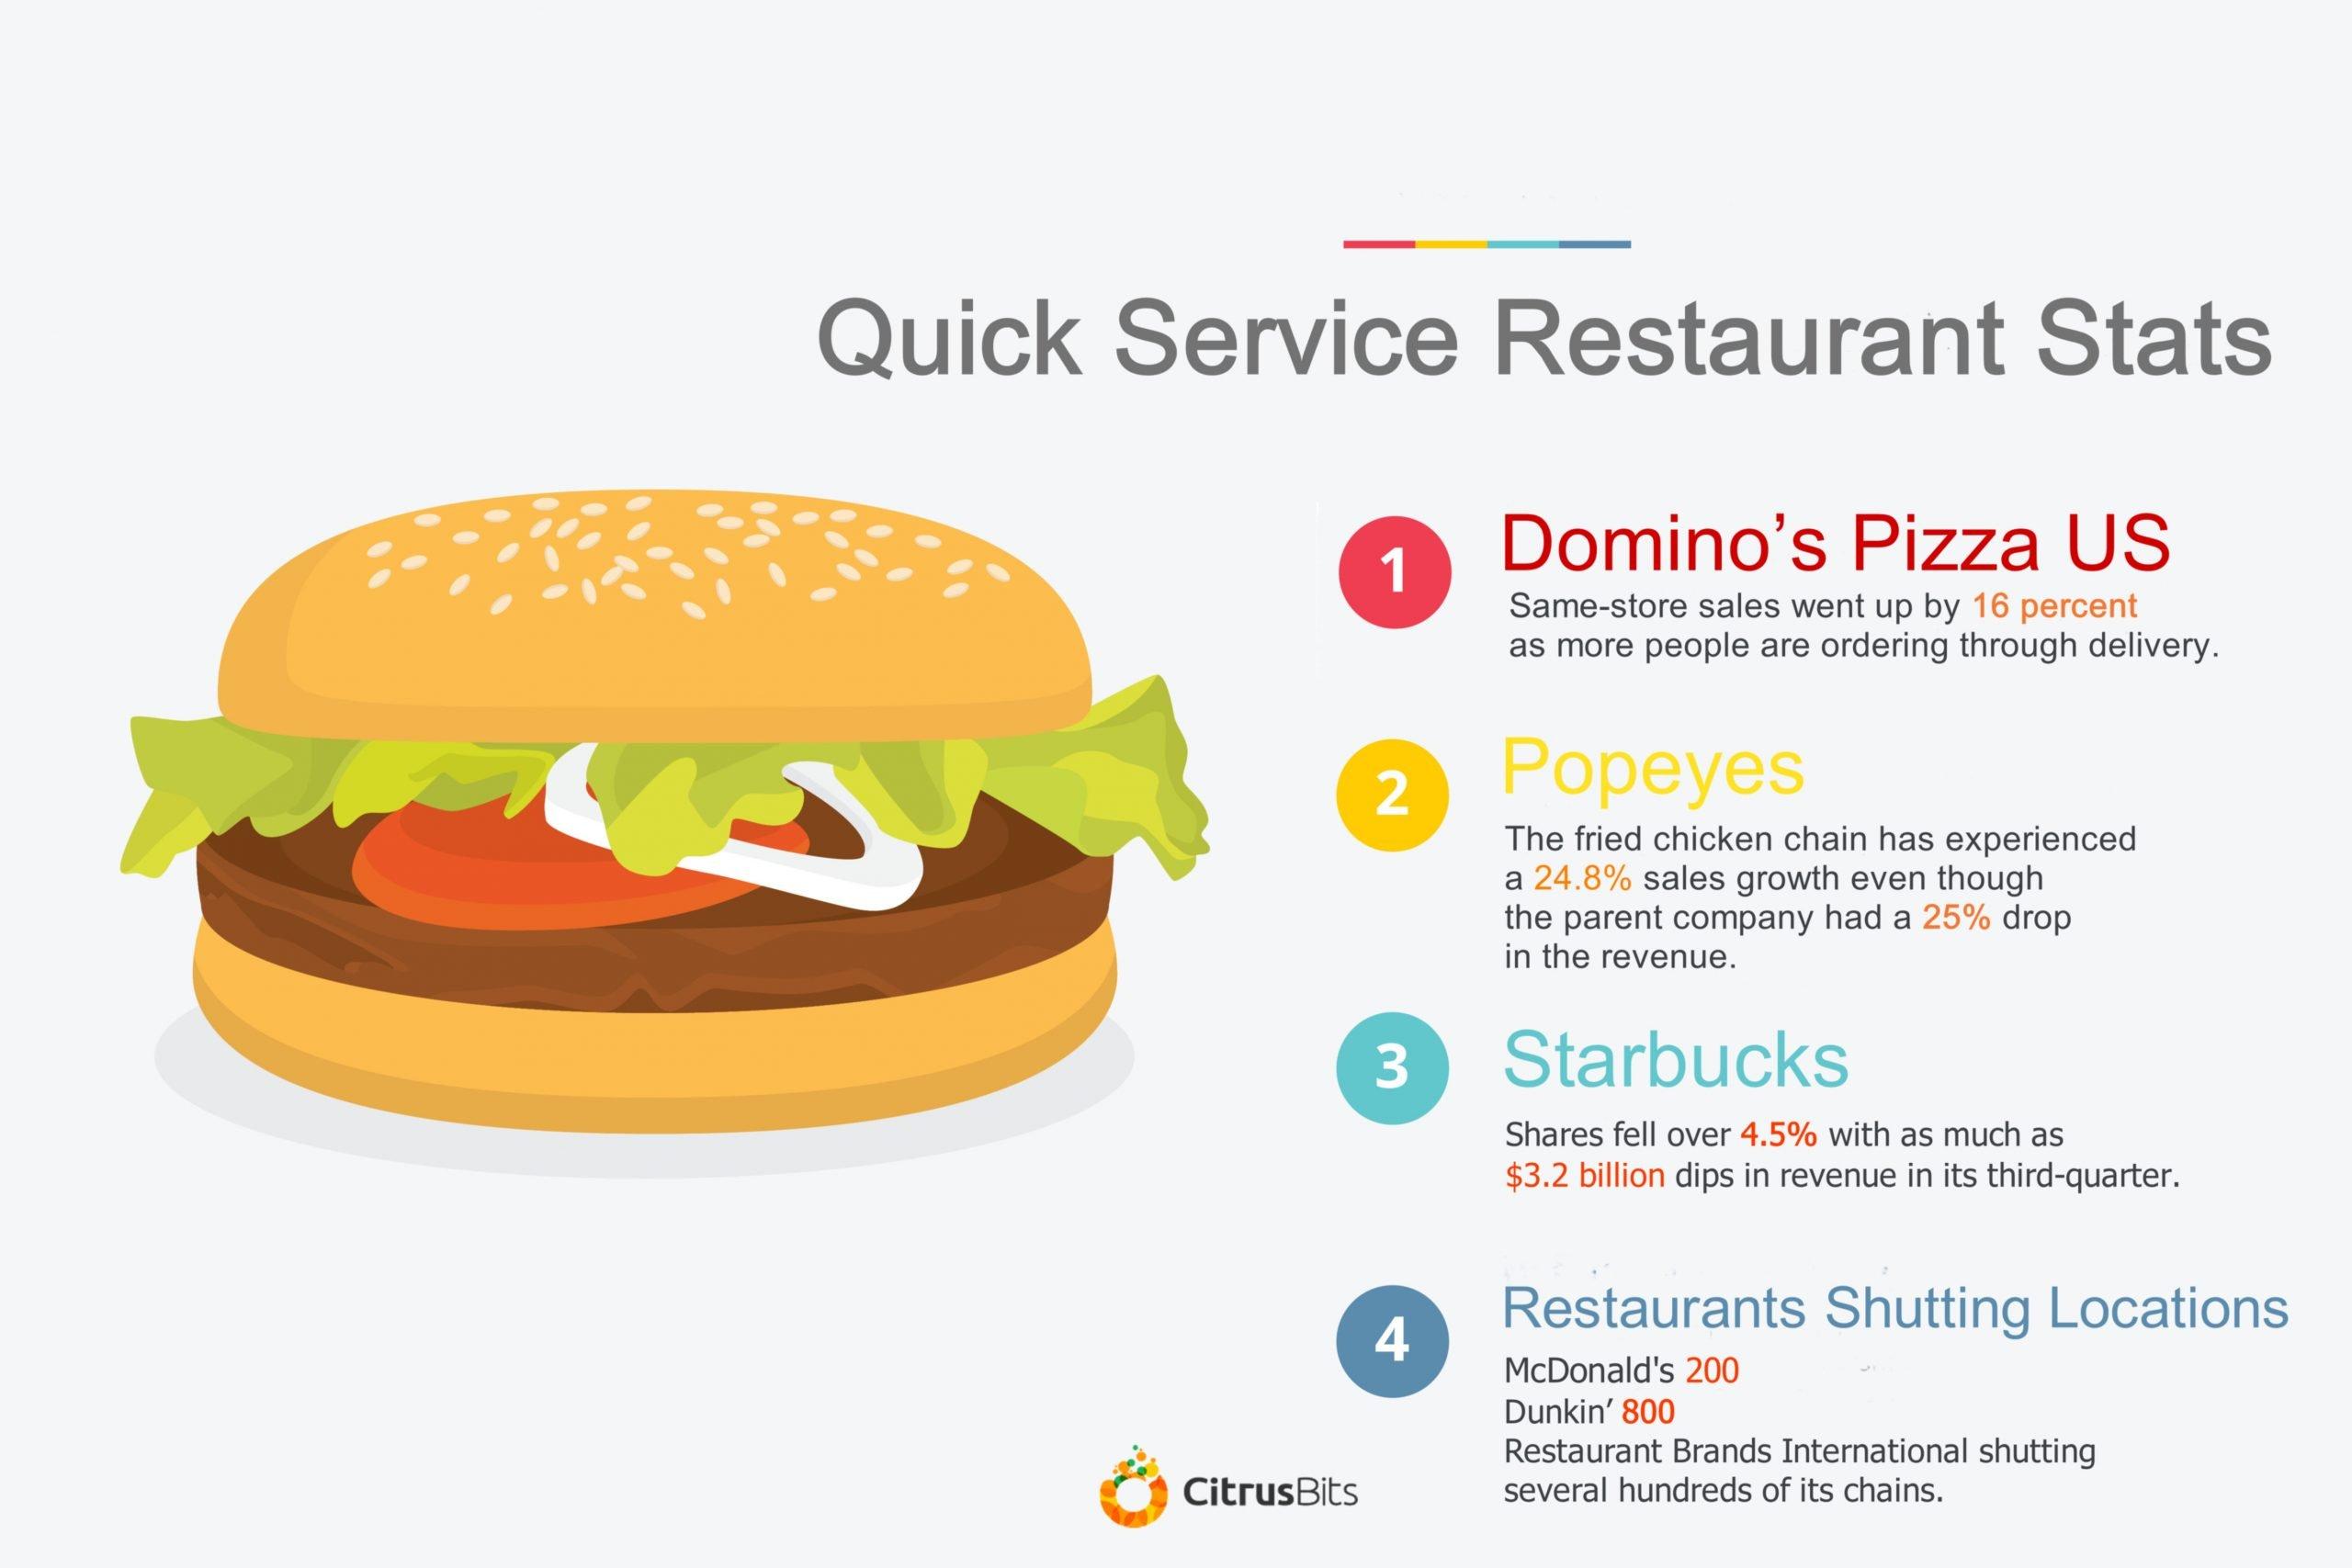 Quick Service Restaurant Stats